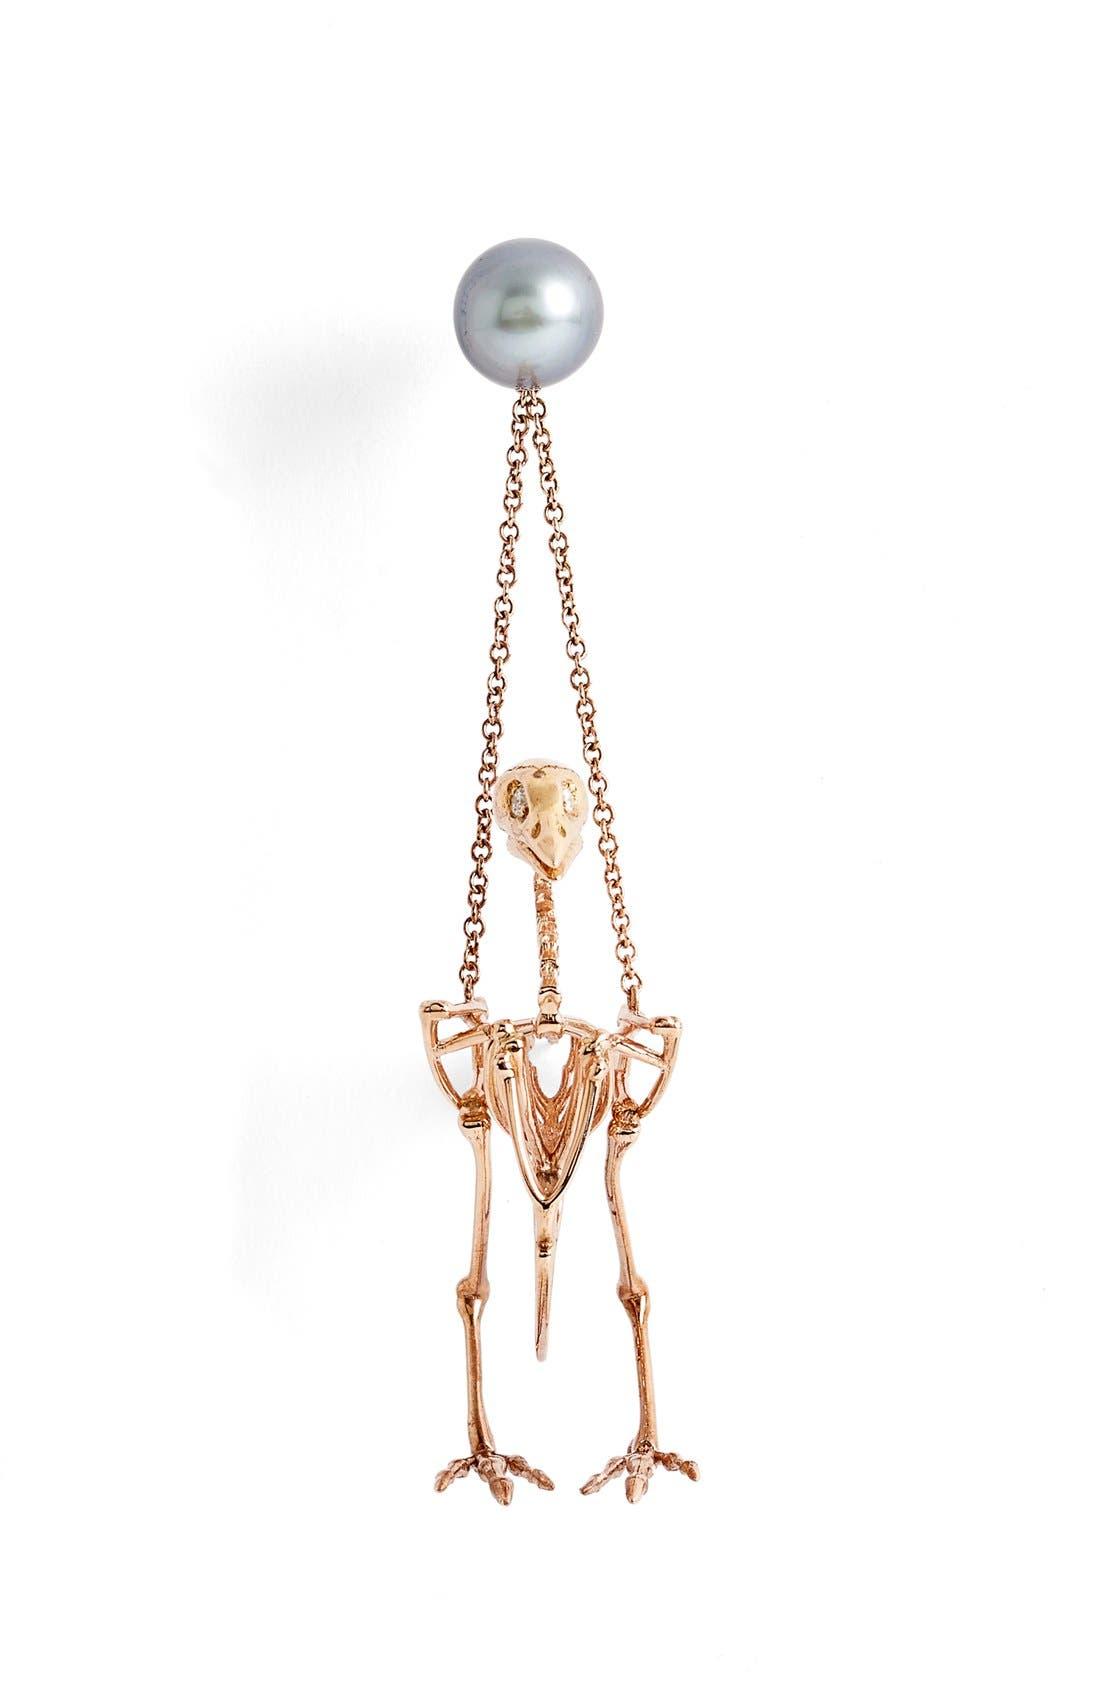 South Sea Pearl & Diamond Small Quail Earring,                             Alternate thumbnail 2, color,                             Rose Gold/ Pearl